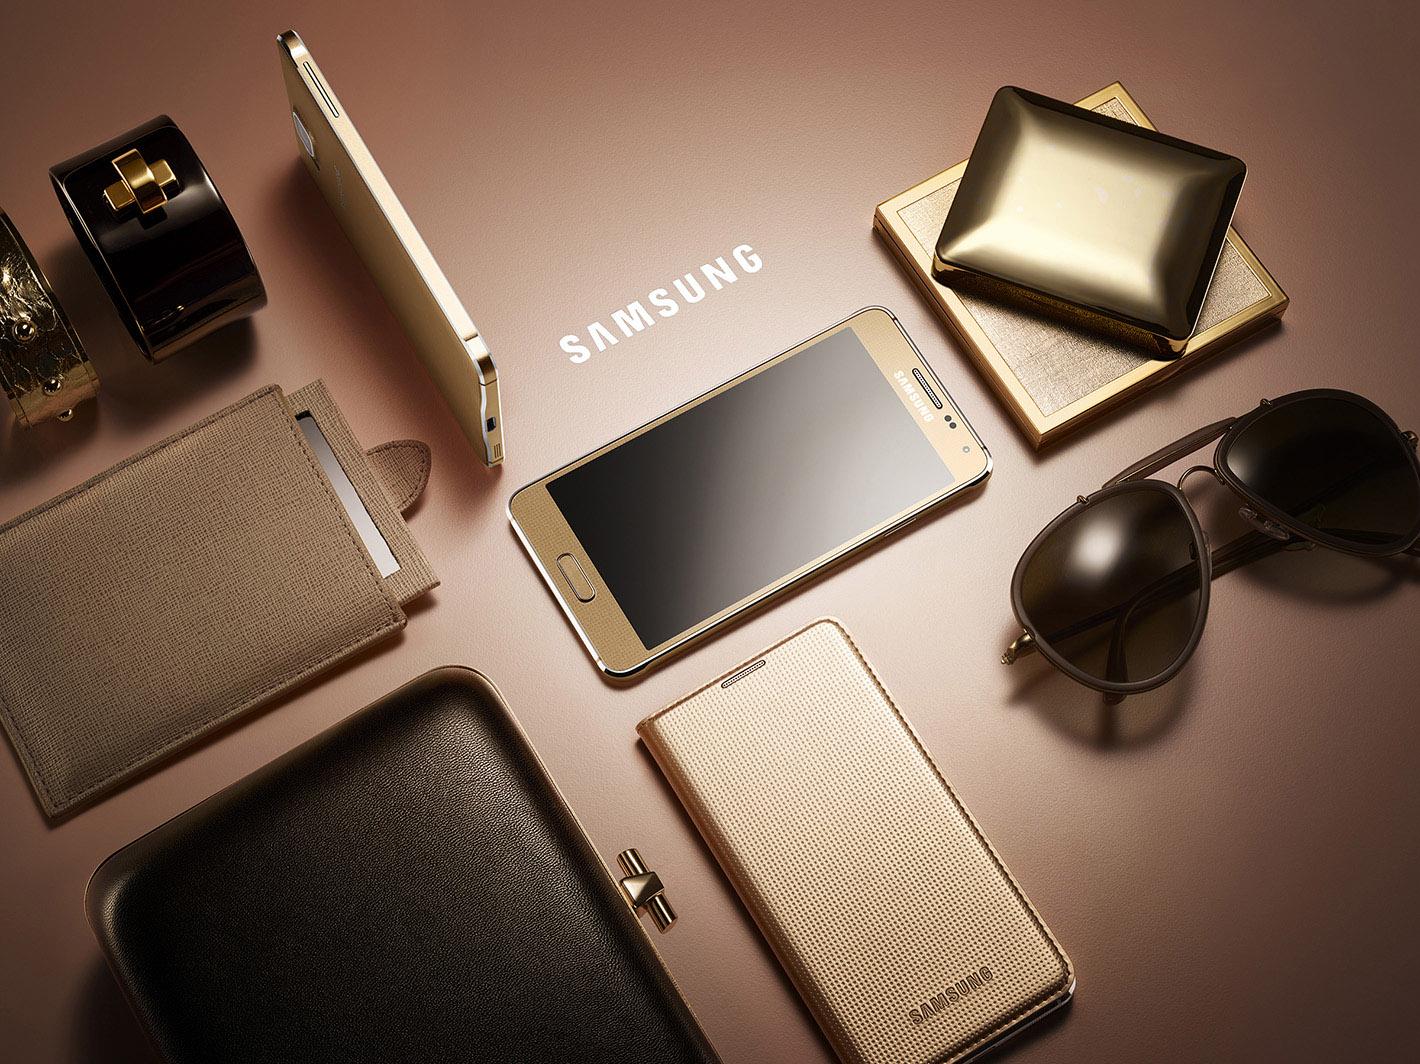 Samsung-retouching-1